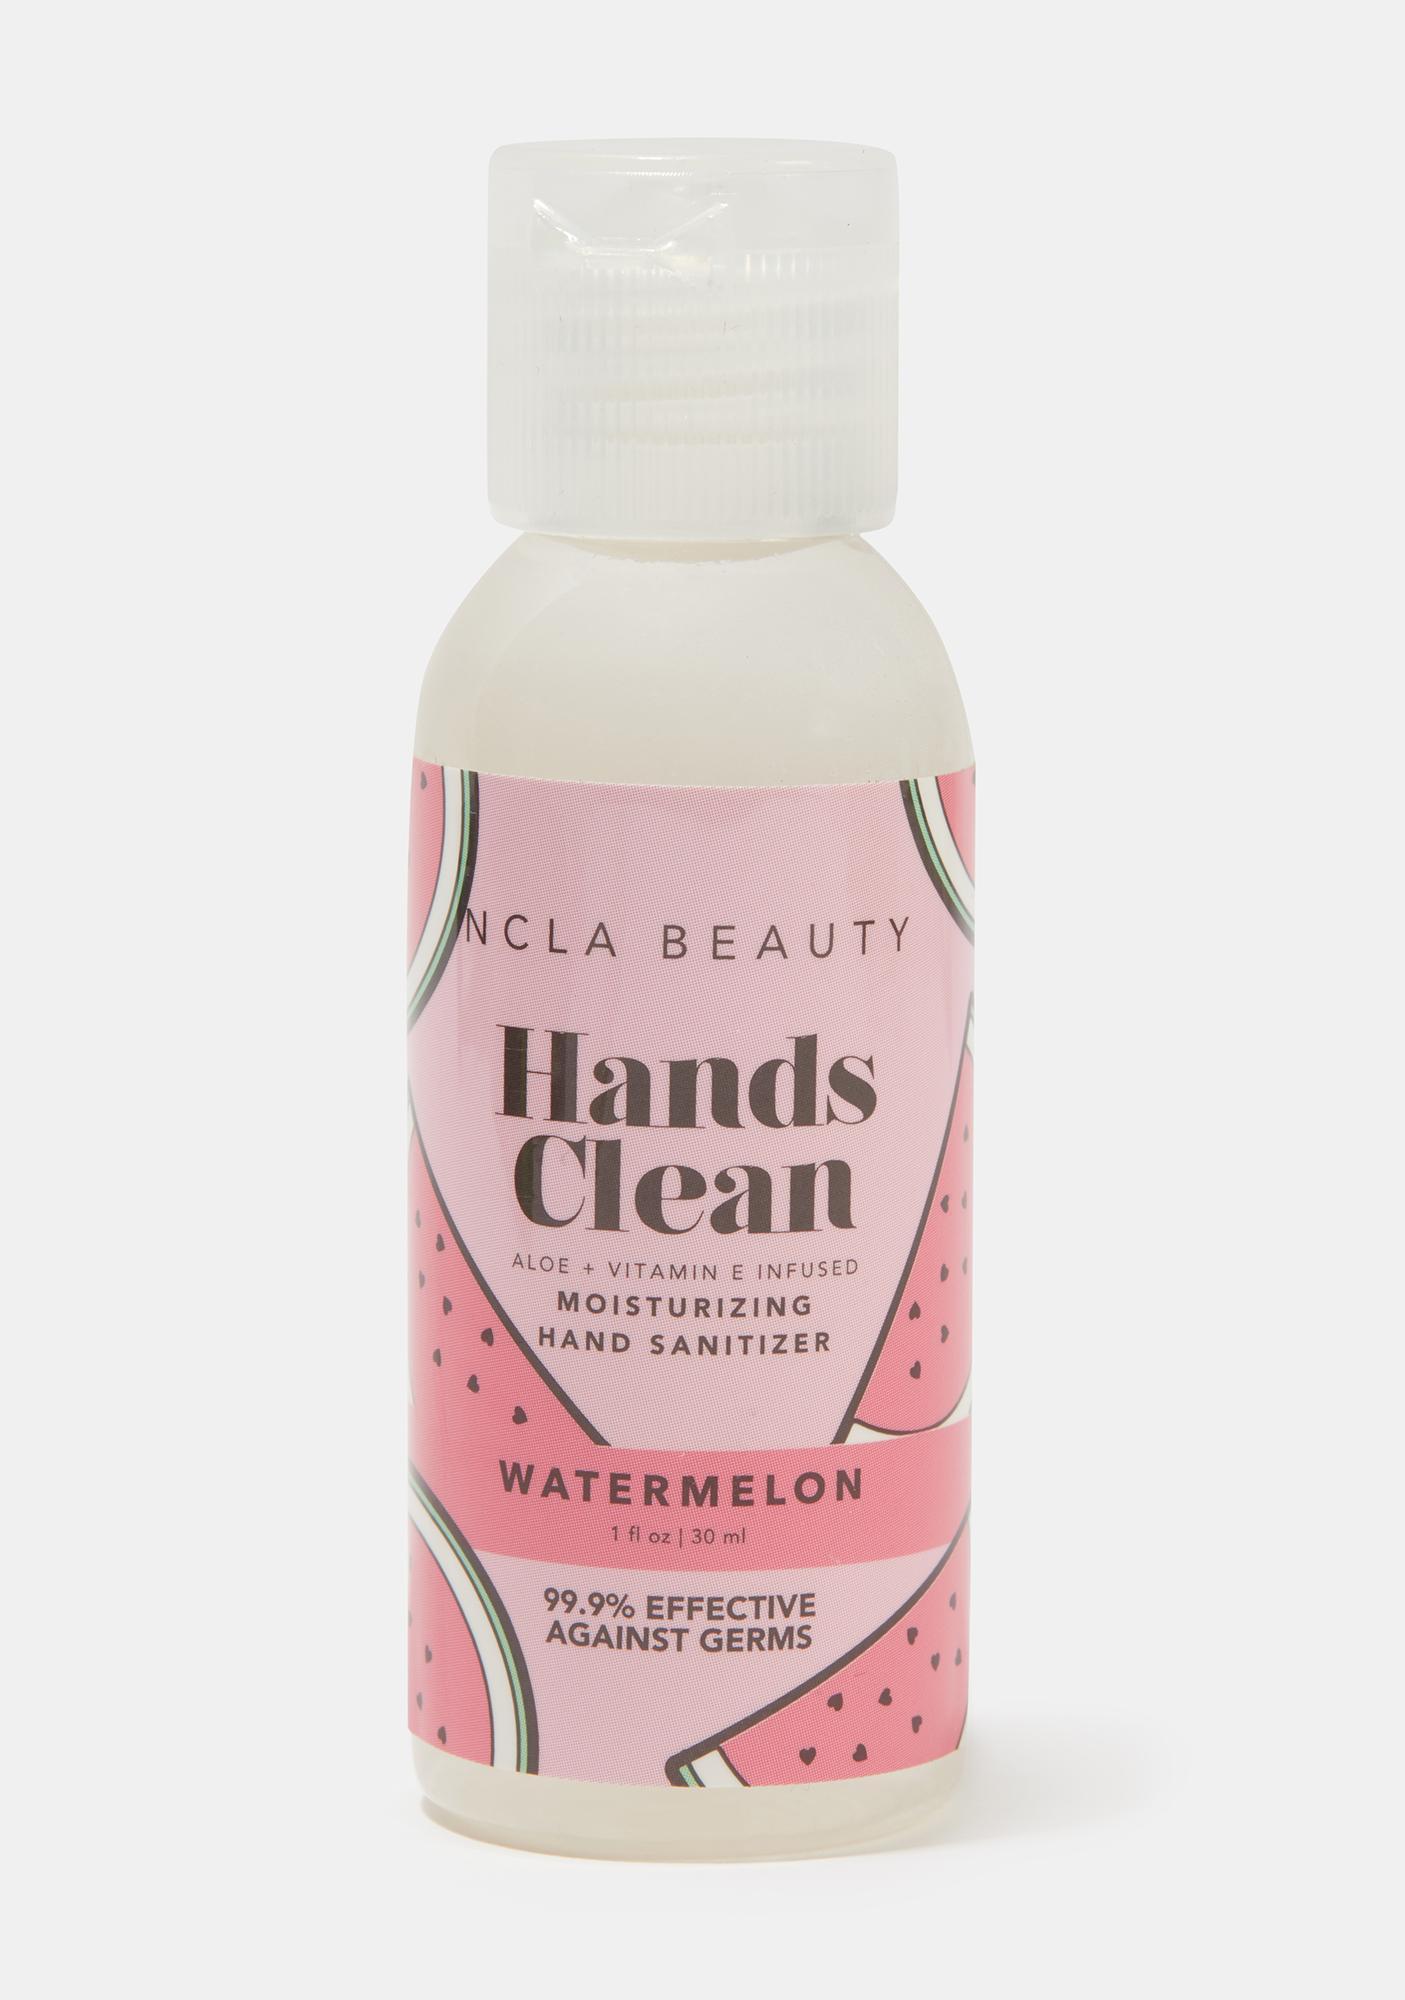 NCLA Watermelon Hands Clean Moisturizing Hand Sanitizer